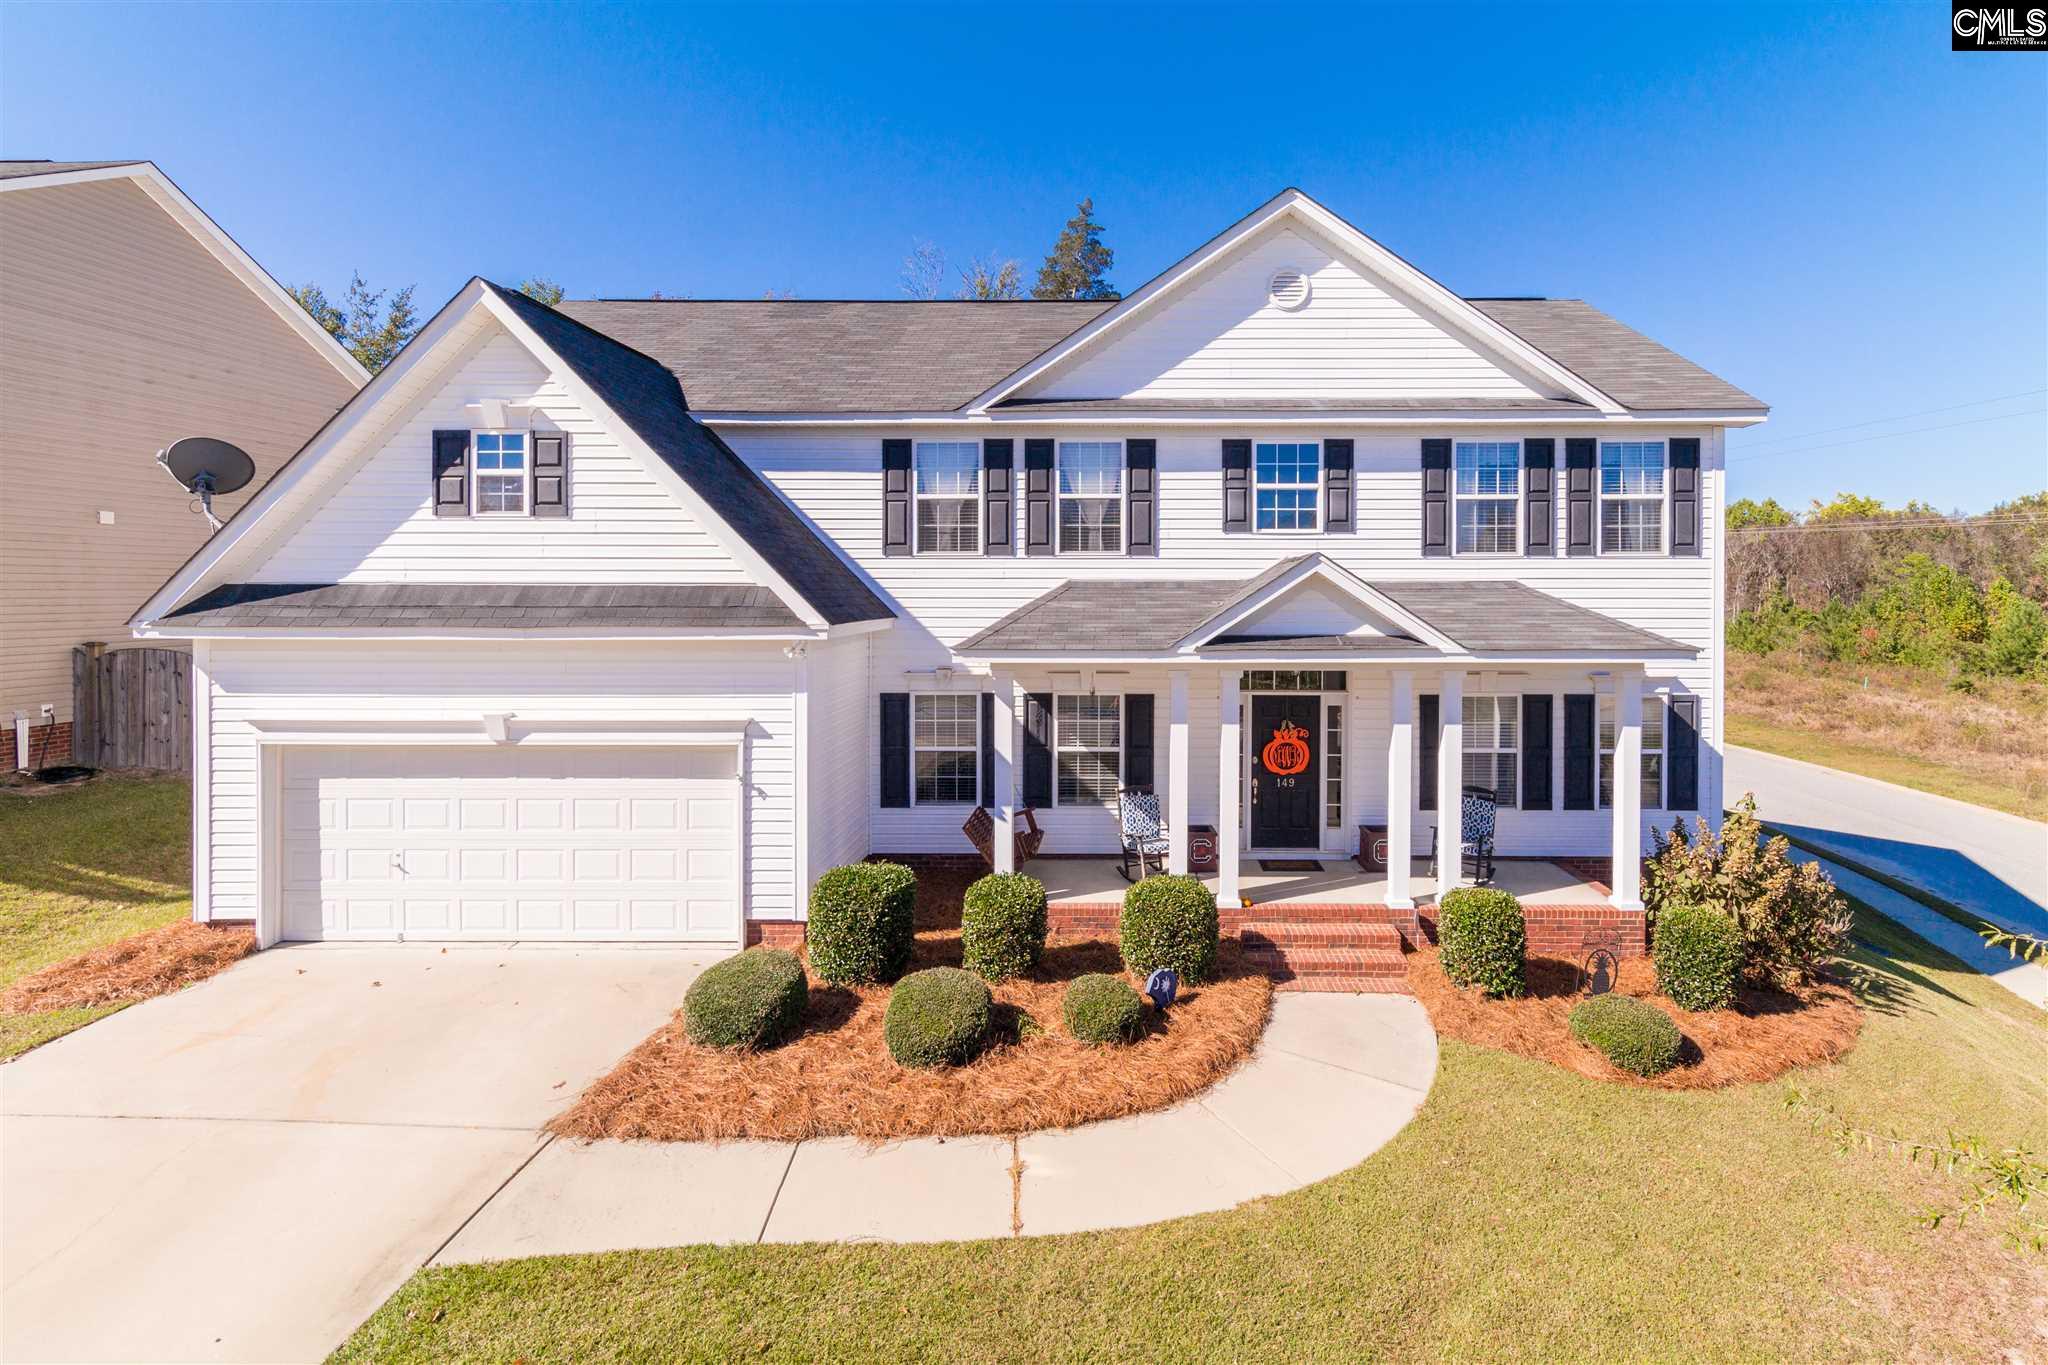 Patio Homes For Sale In Lexington Sc Patio Homes For Sale In Lexington Sc